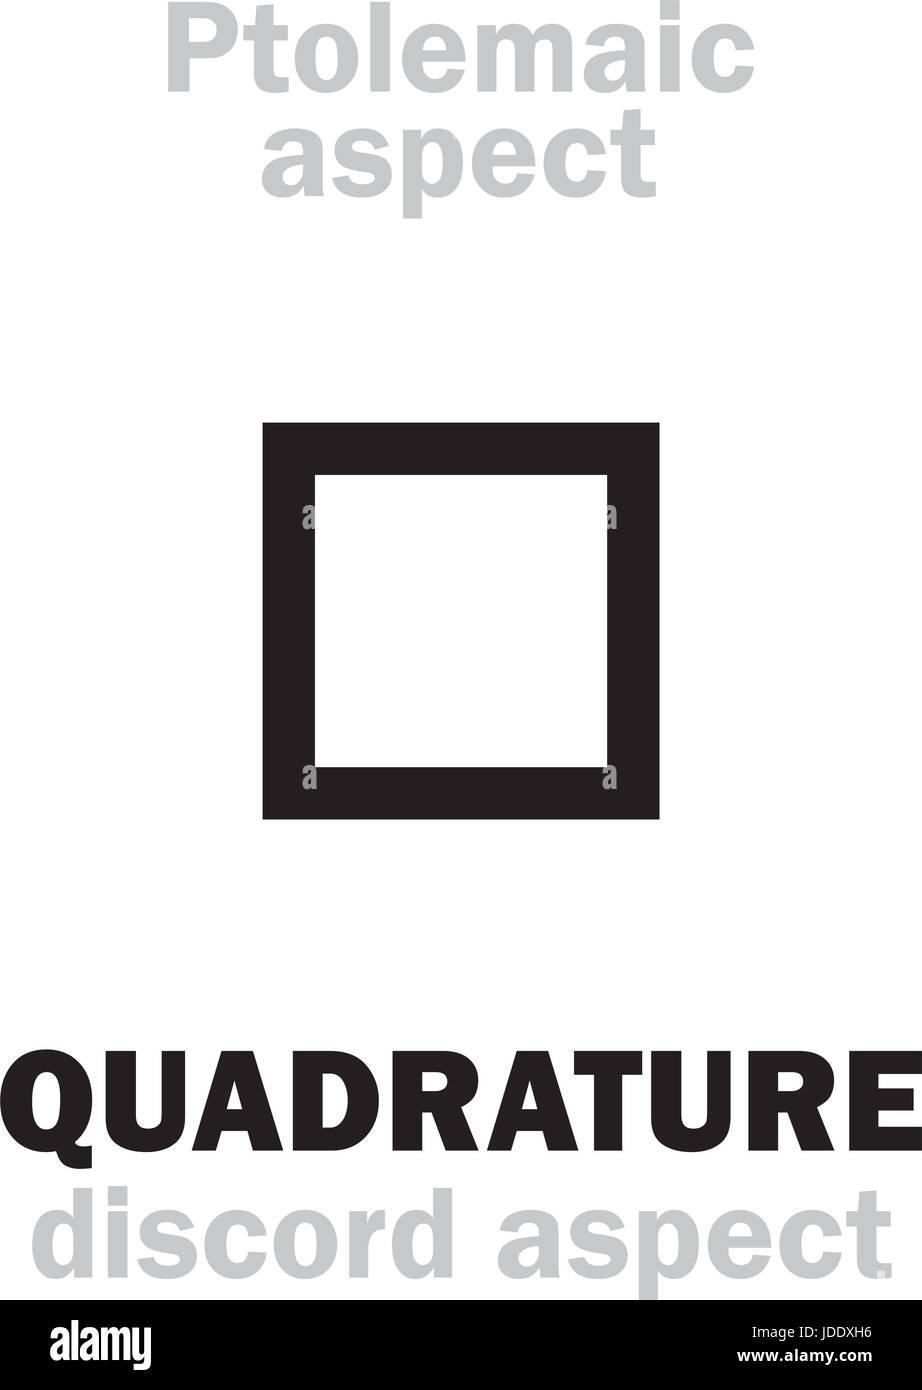 Astrology Alphabet: QUADRATURE (90°), classic major Ptolemaic discordant aspect. Hieroglyphics character sign - Stock Image